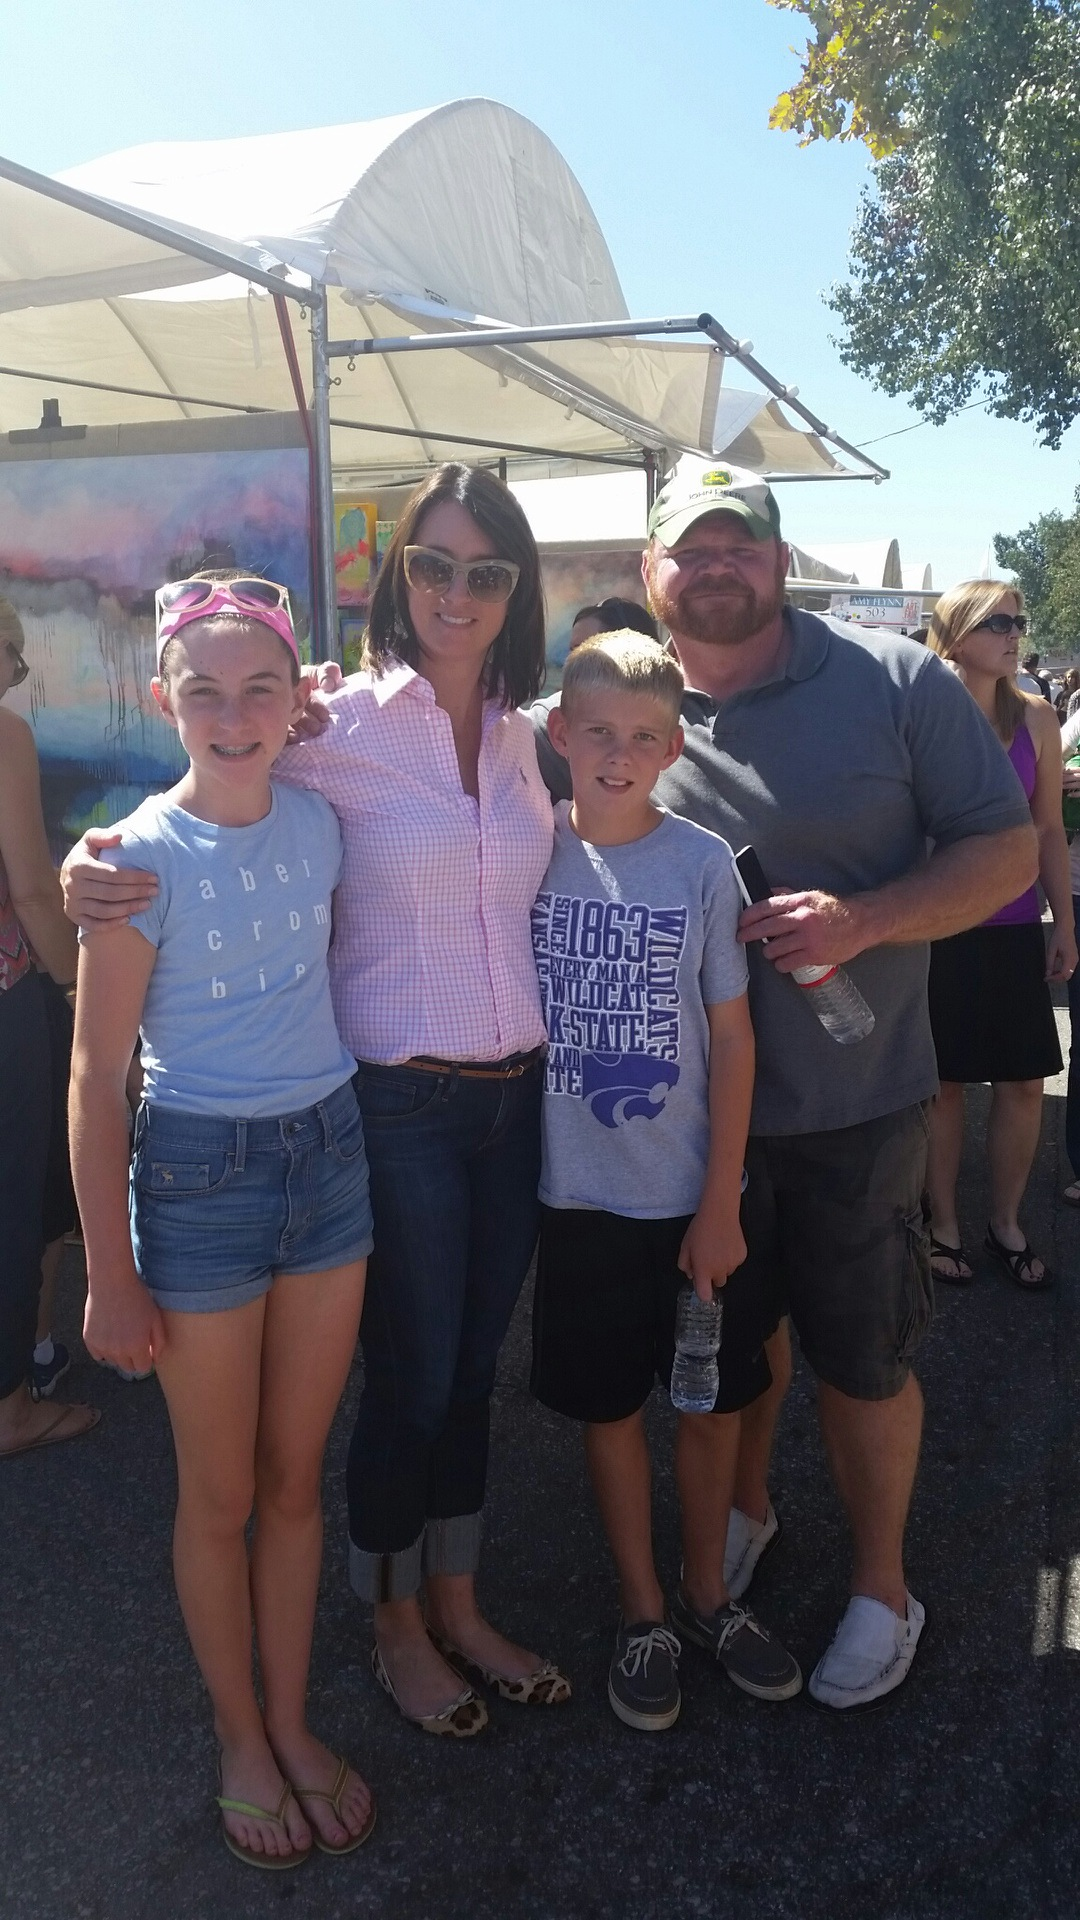 The family at the Plaza Art Fair.